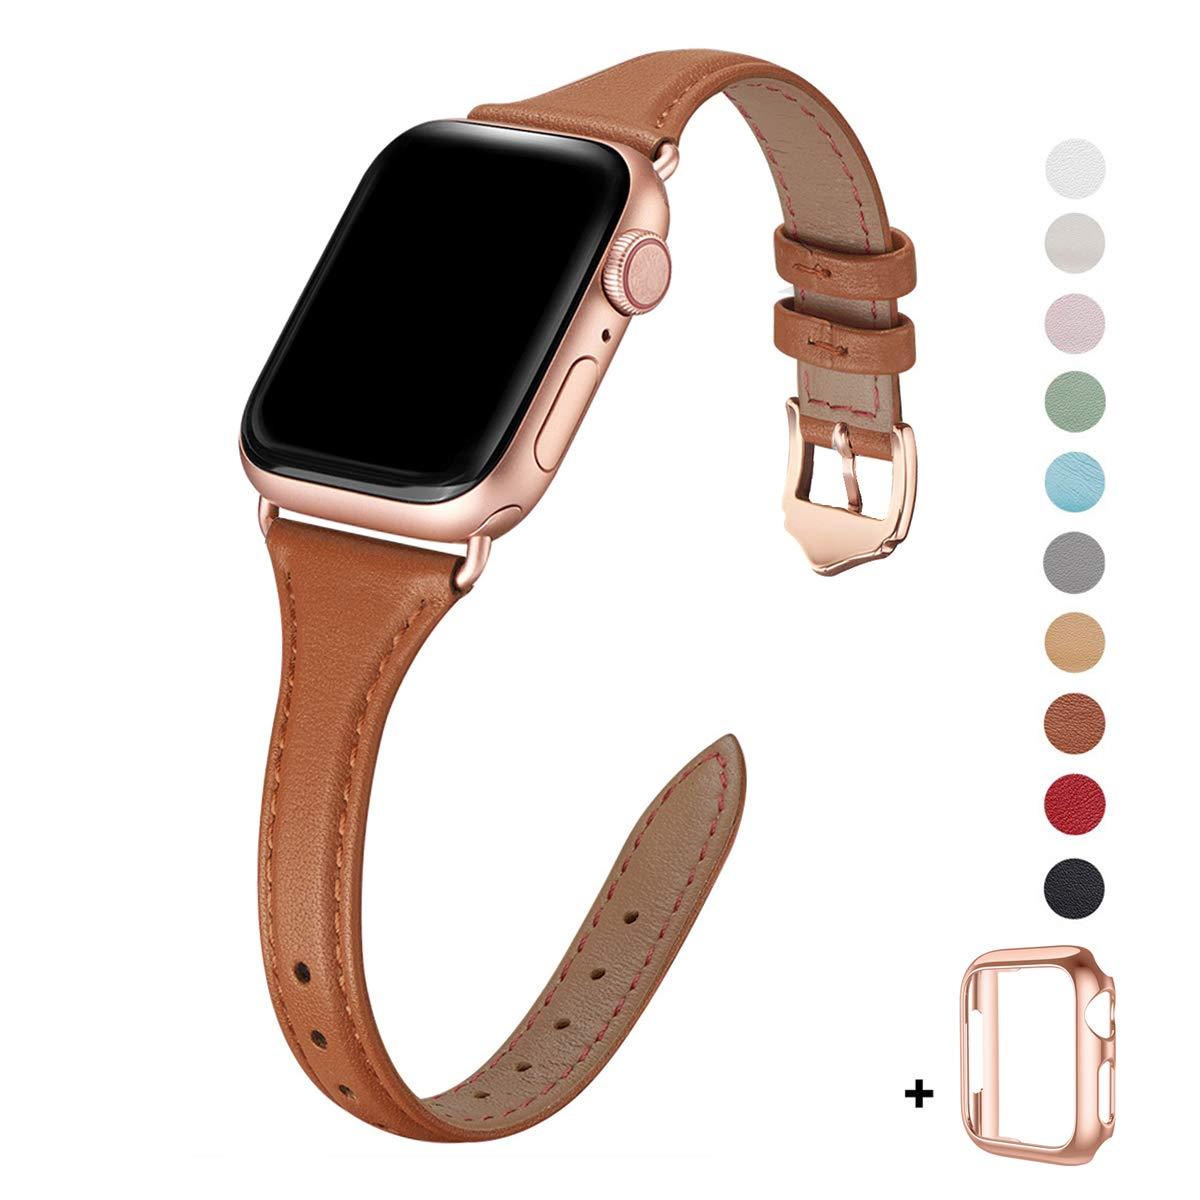 Malla Cuero para Apple Watch (42/44mm) WFEAGL [7W759B5L]